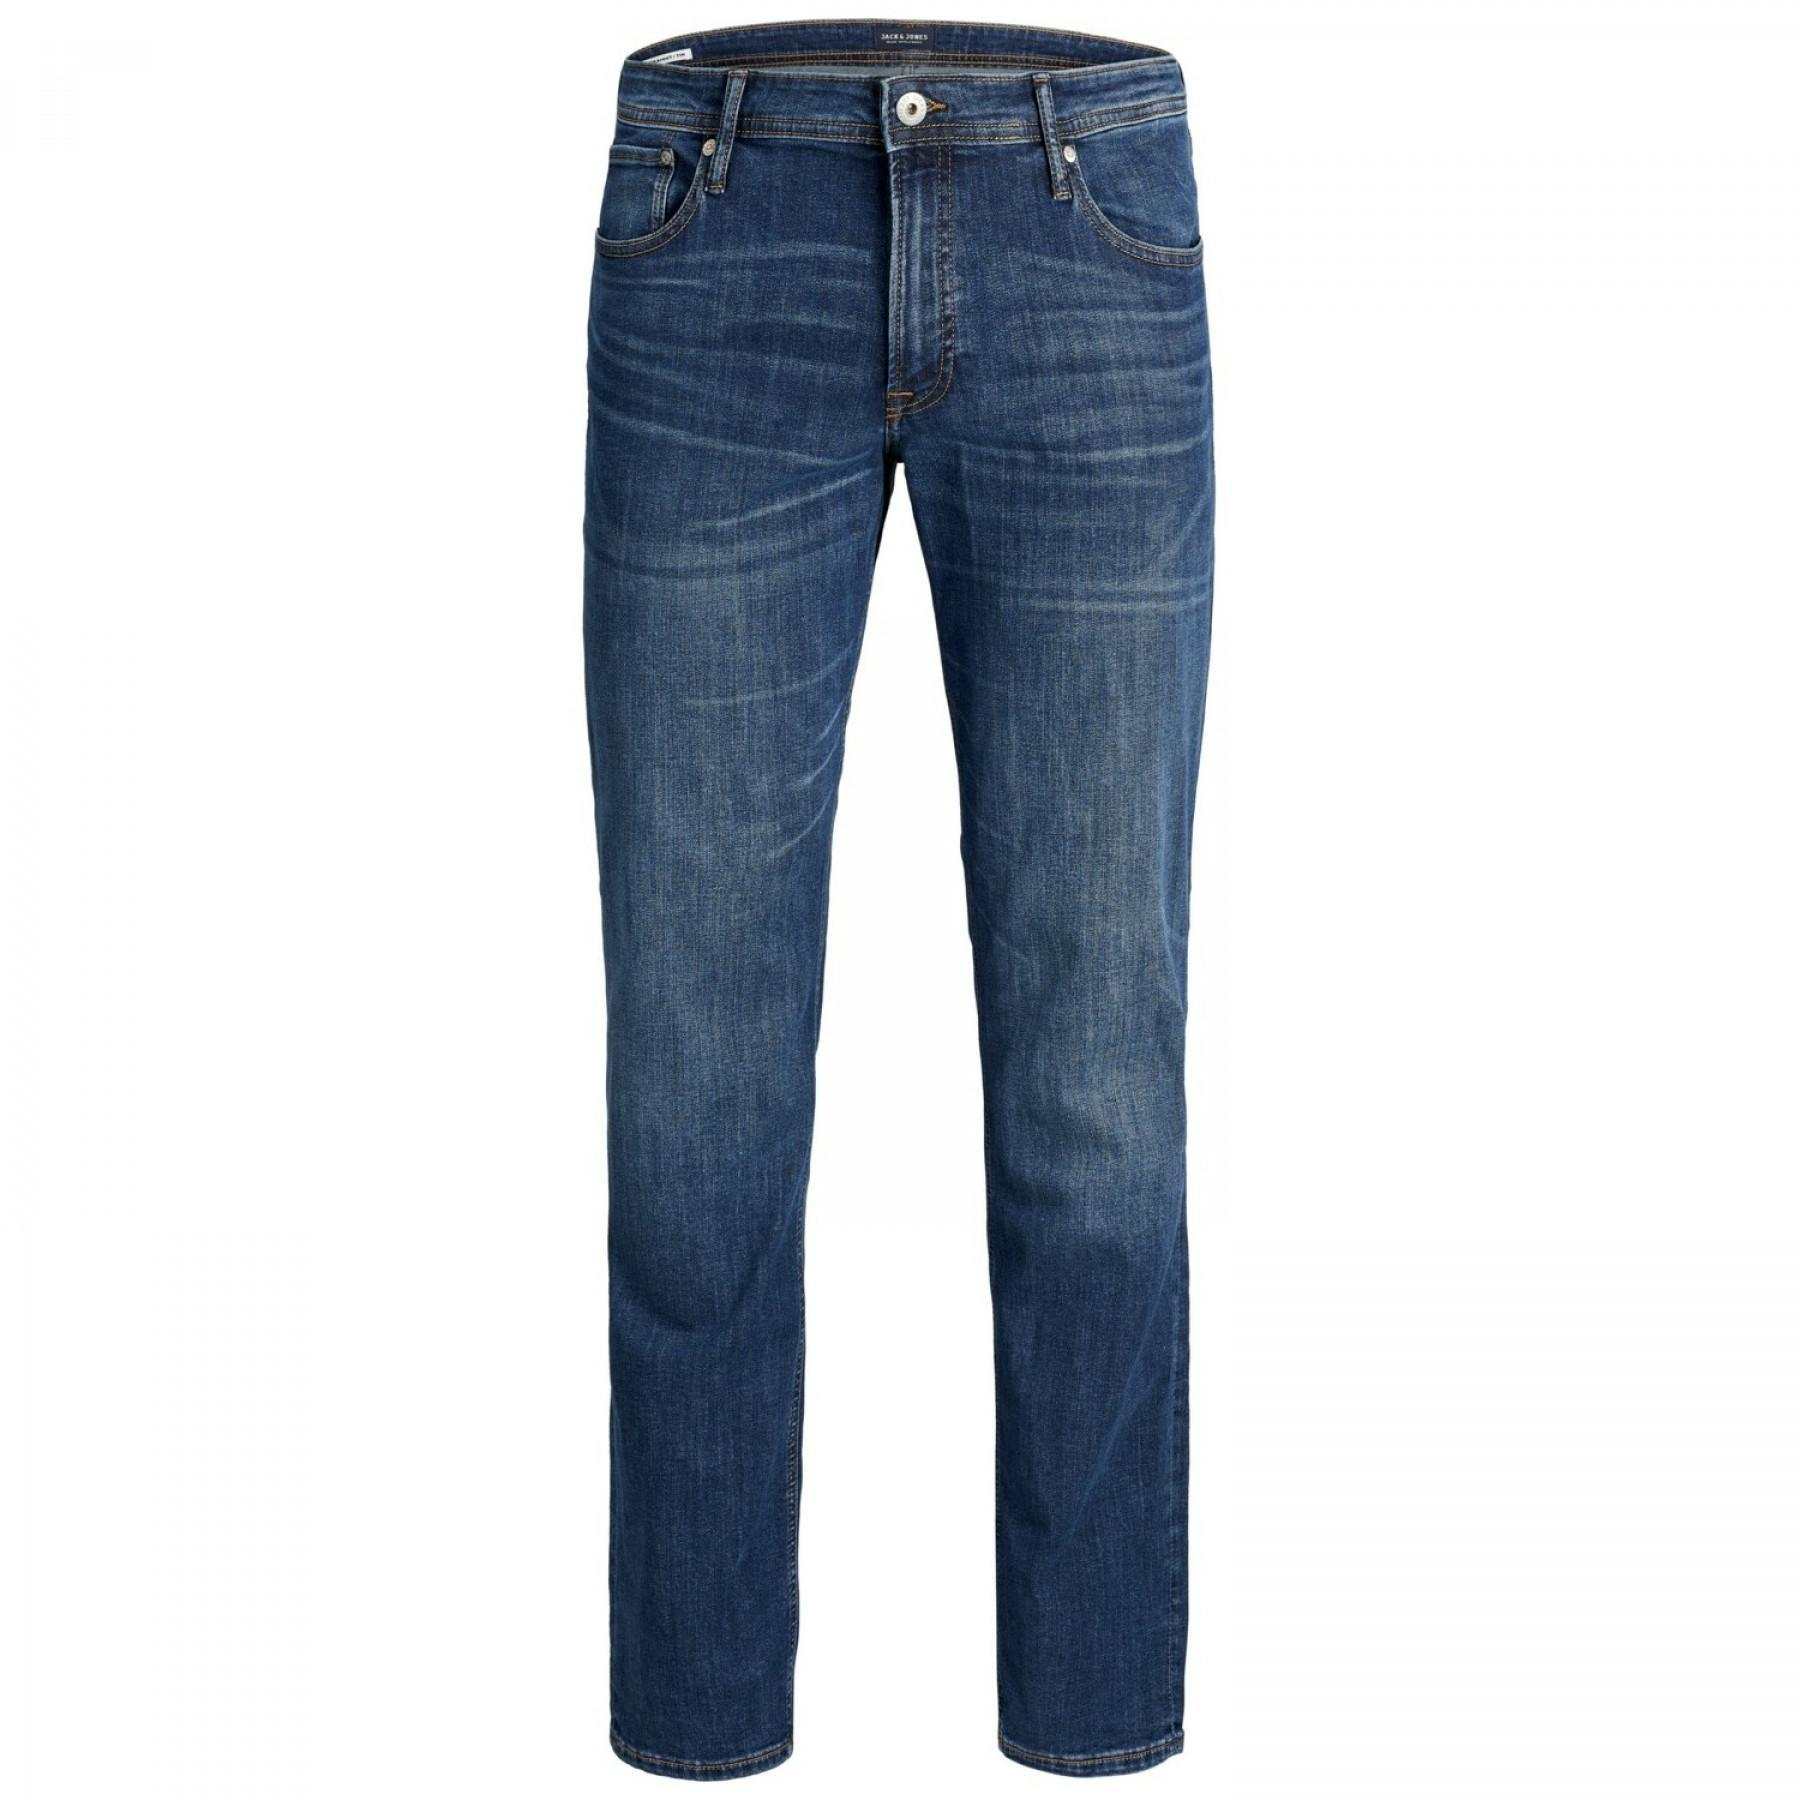 Jeans Jack & Jones Tim Original 814